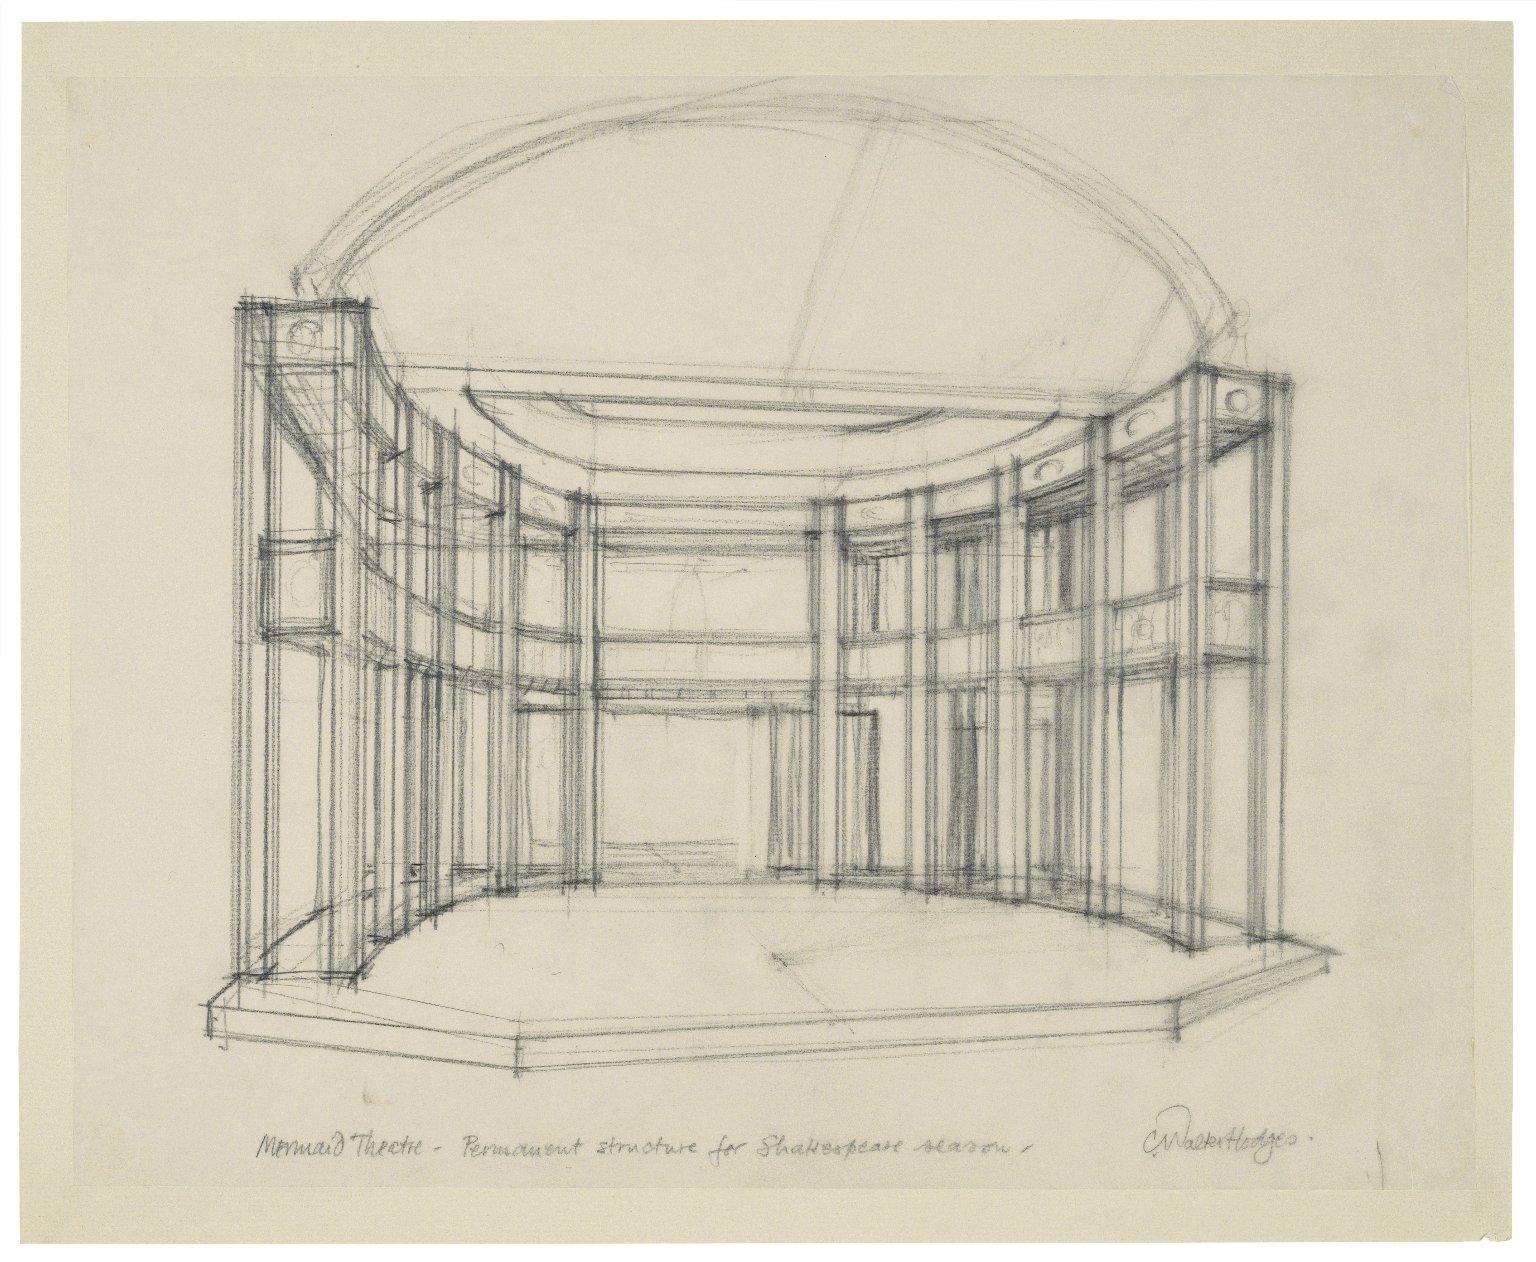 Permanent set structure design for Mermaid theatre